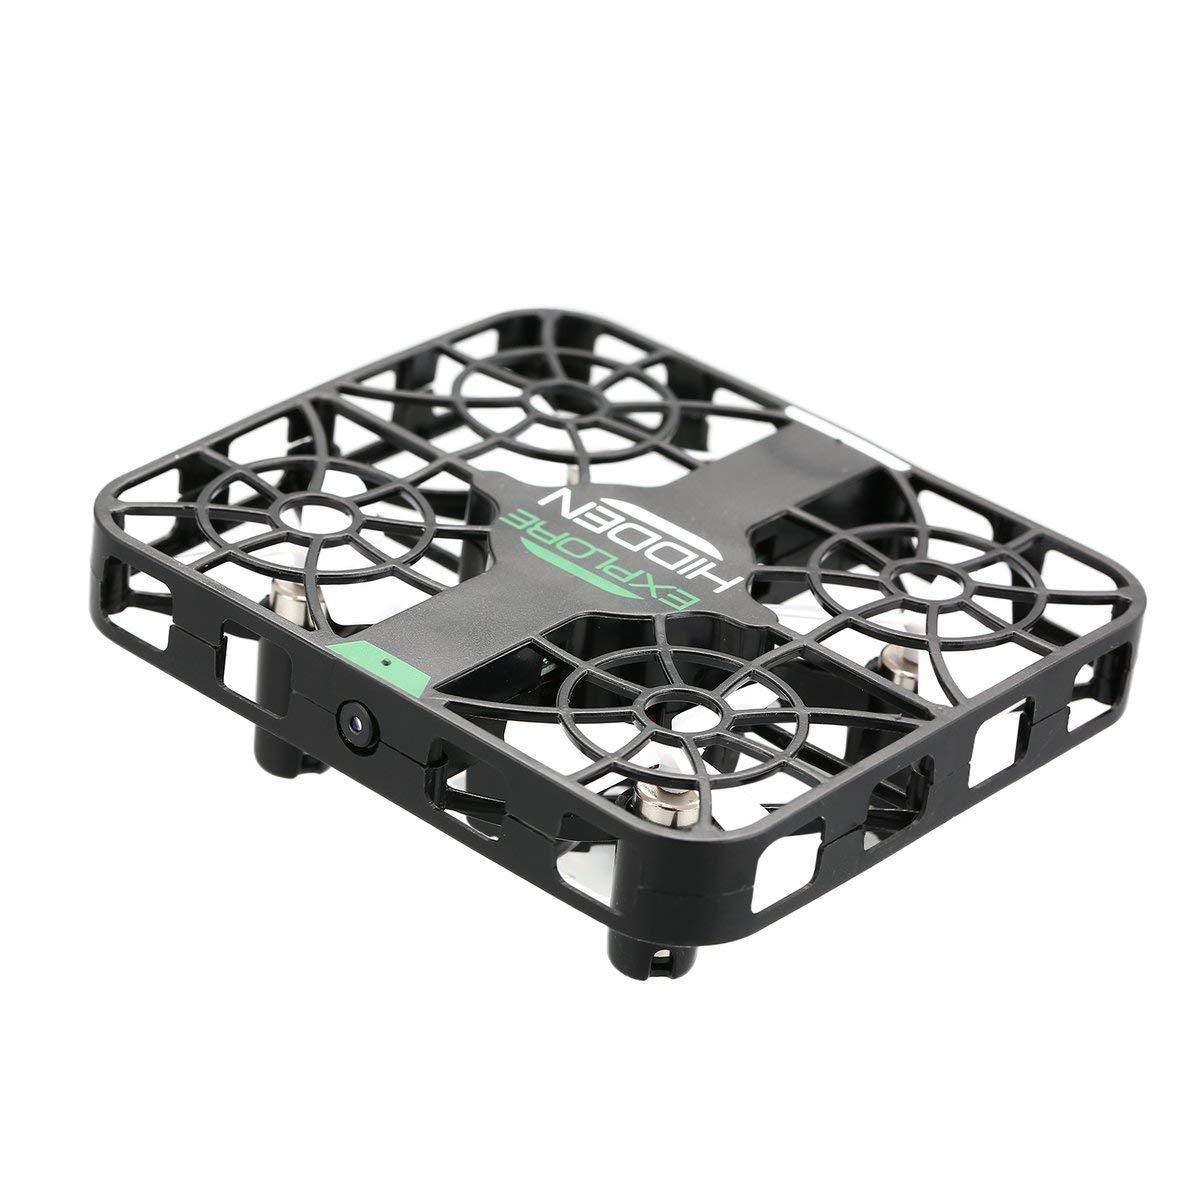 Gugutogo RC Drone QS003 2,4 Ghz Drohne mit Kamera Mini RC Quadcopter Drone Flugzeug UAV mit 0.3MP WiFi FPV Kamera Höhe Halten Crashworthy Struktur 3D Flip